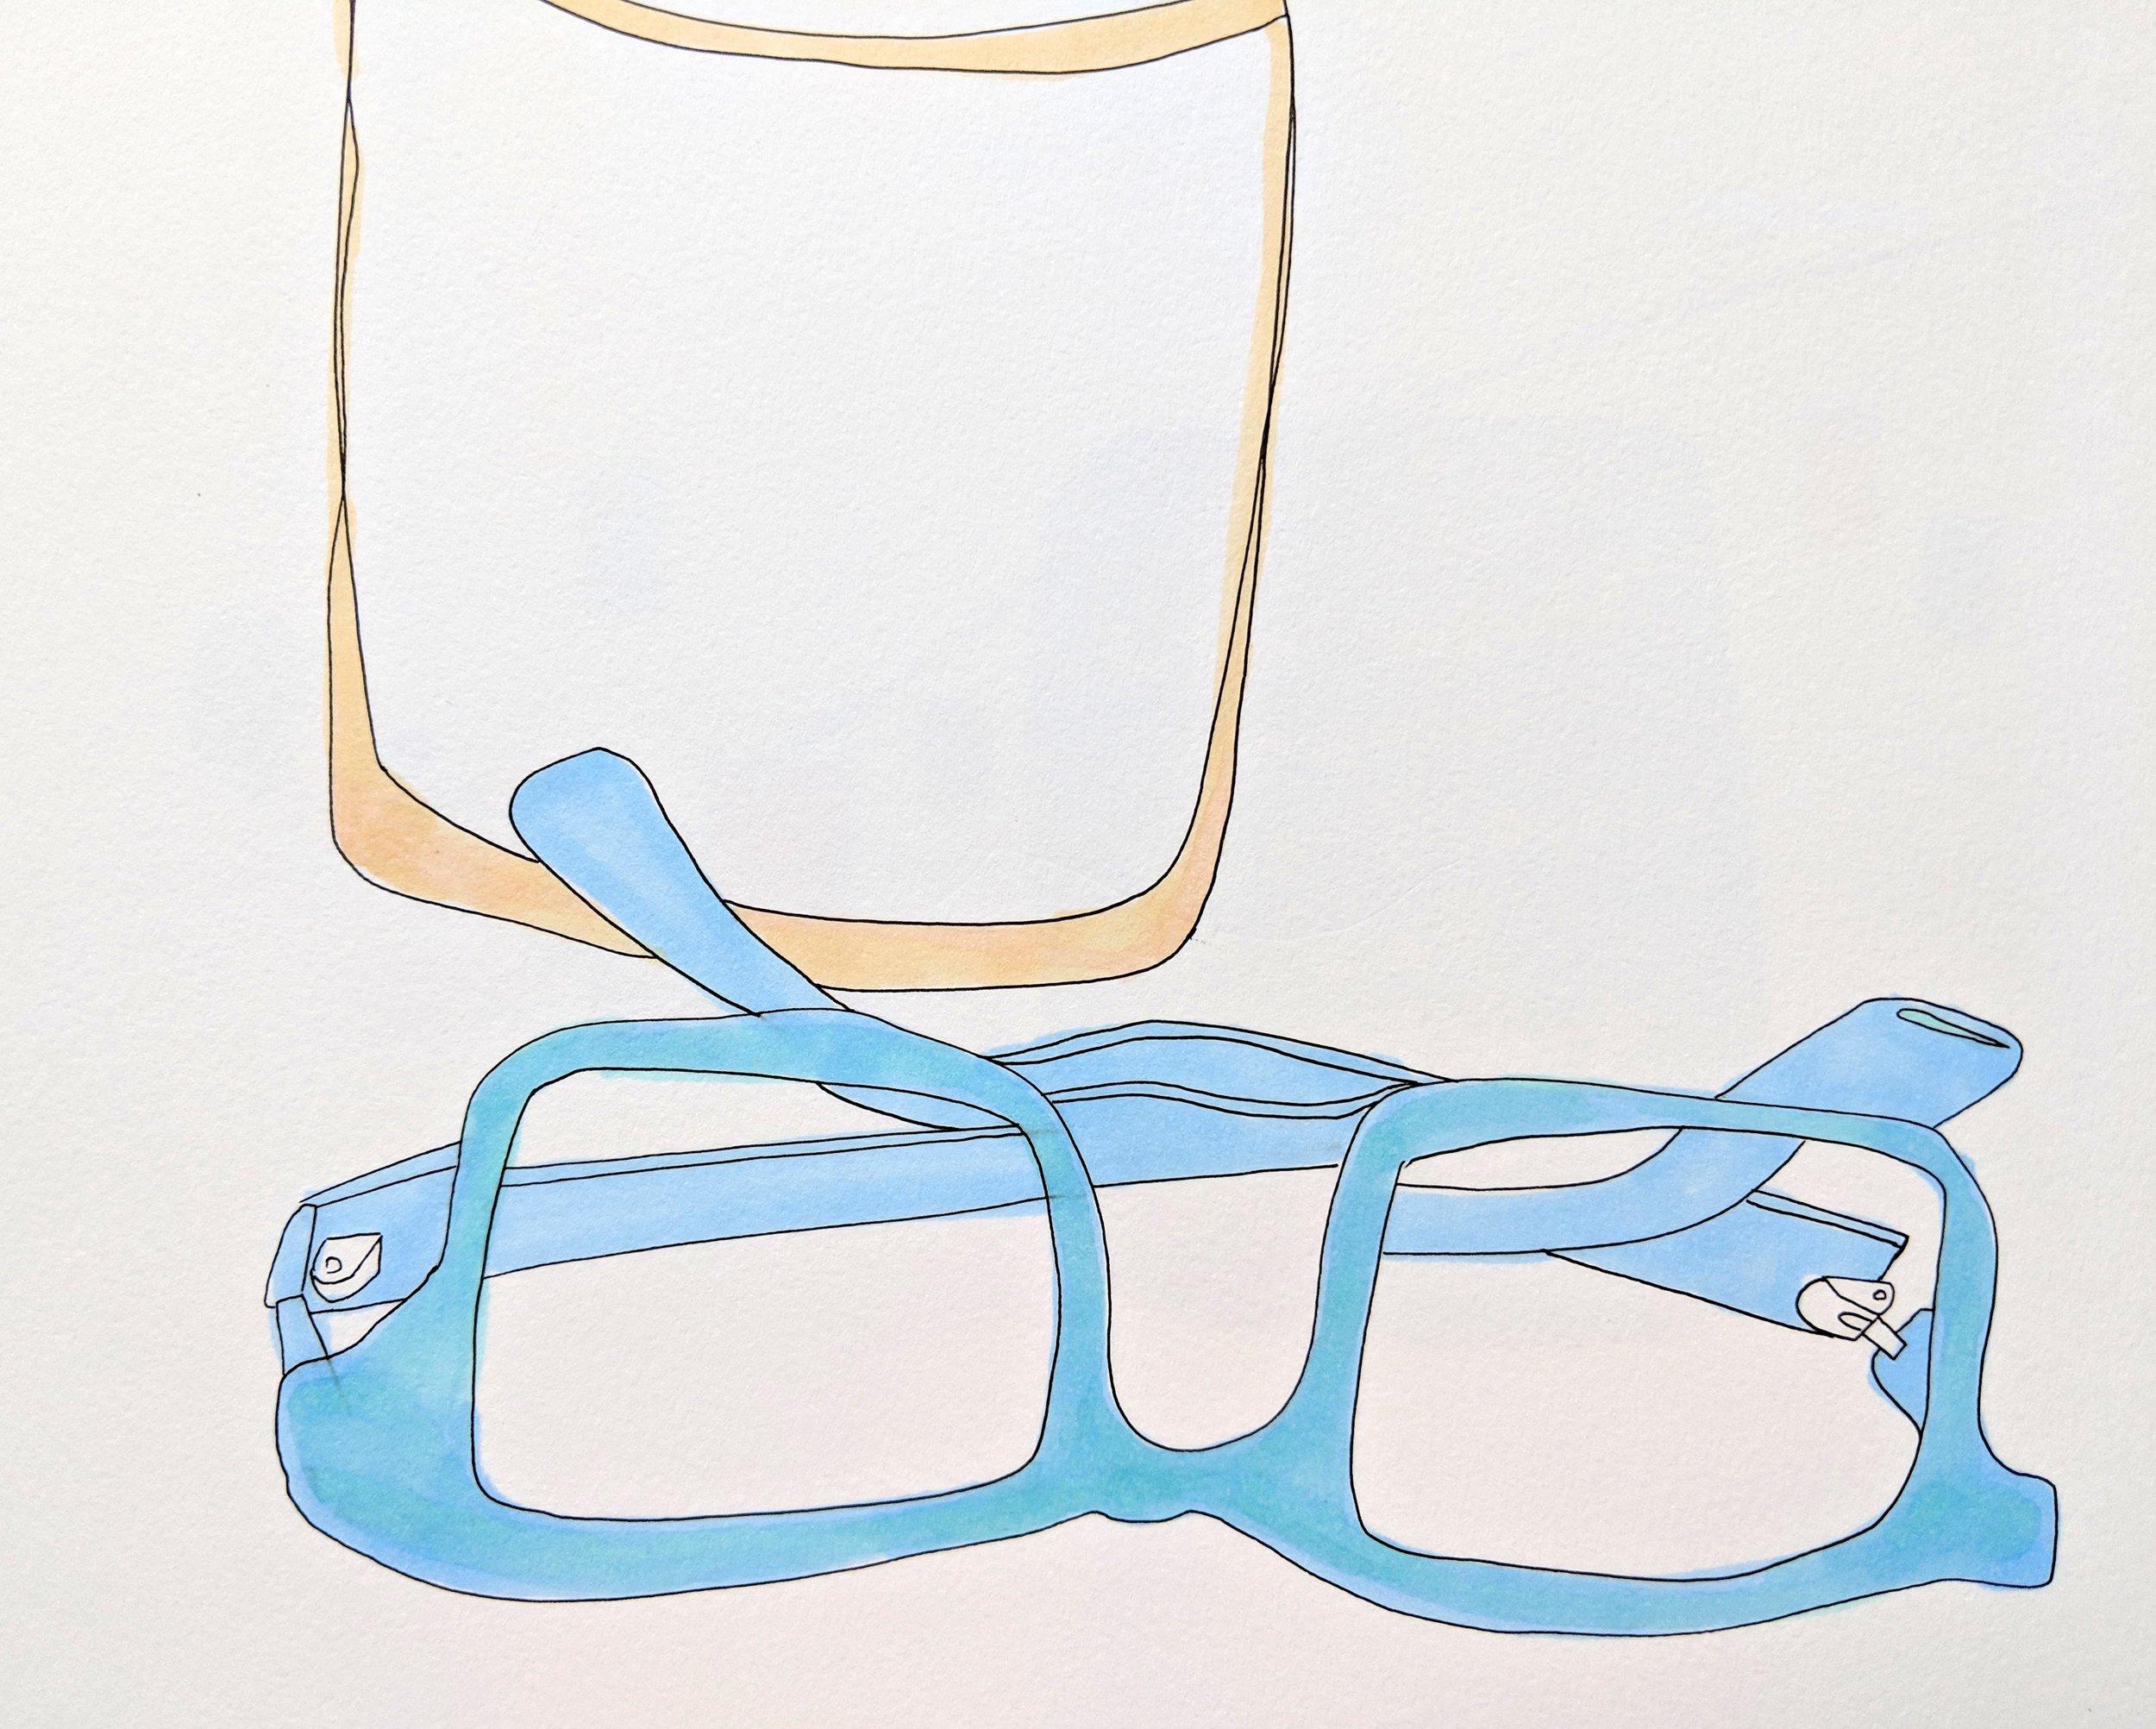 glasses-katvellos.jpg